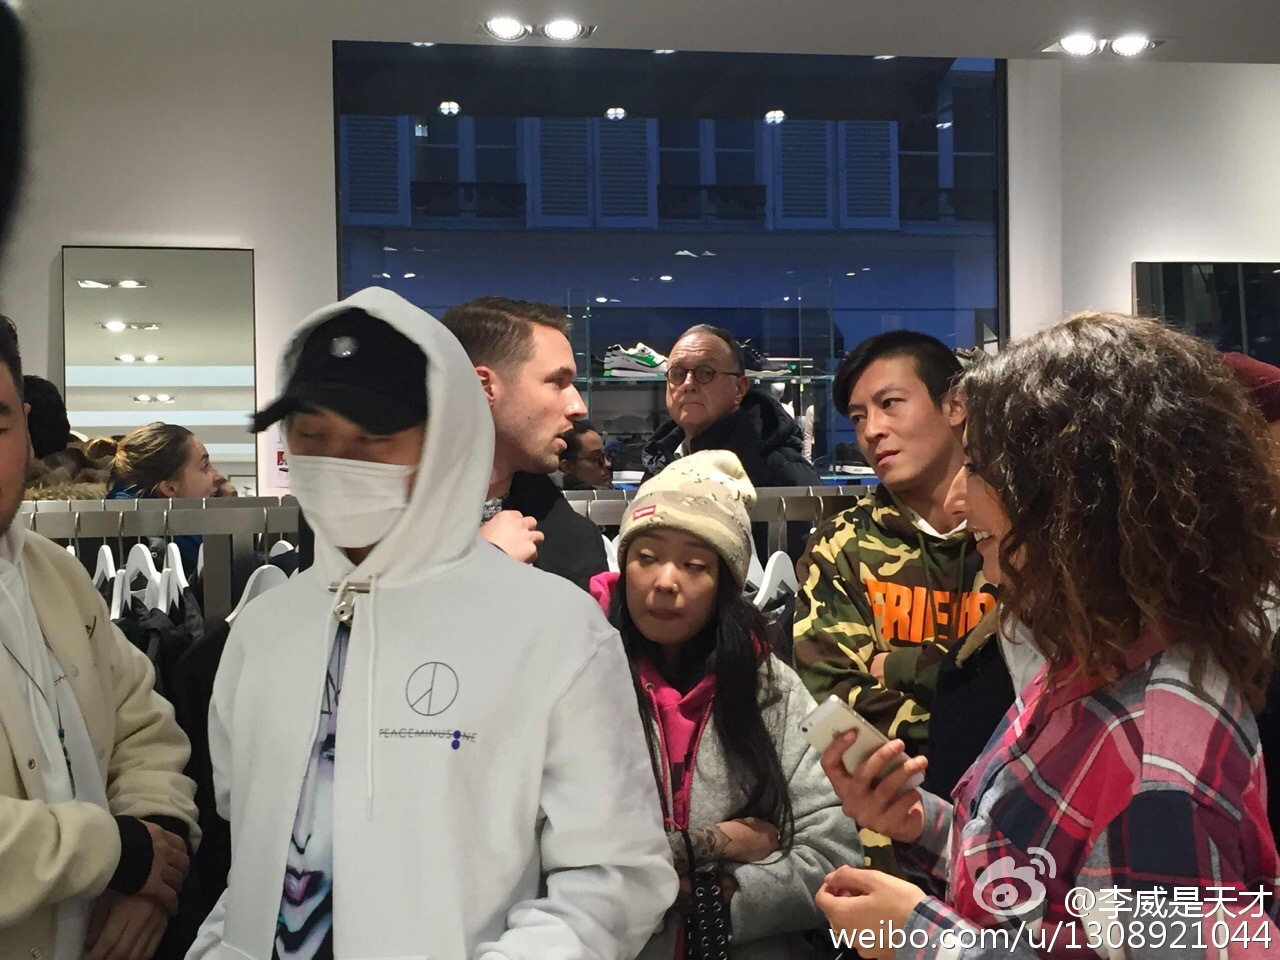 G-Dragon - Colette X Peaceminusone - 23jan2016 - 1308921044 - 01